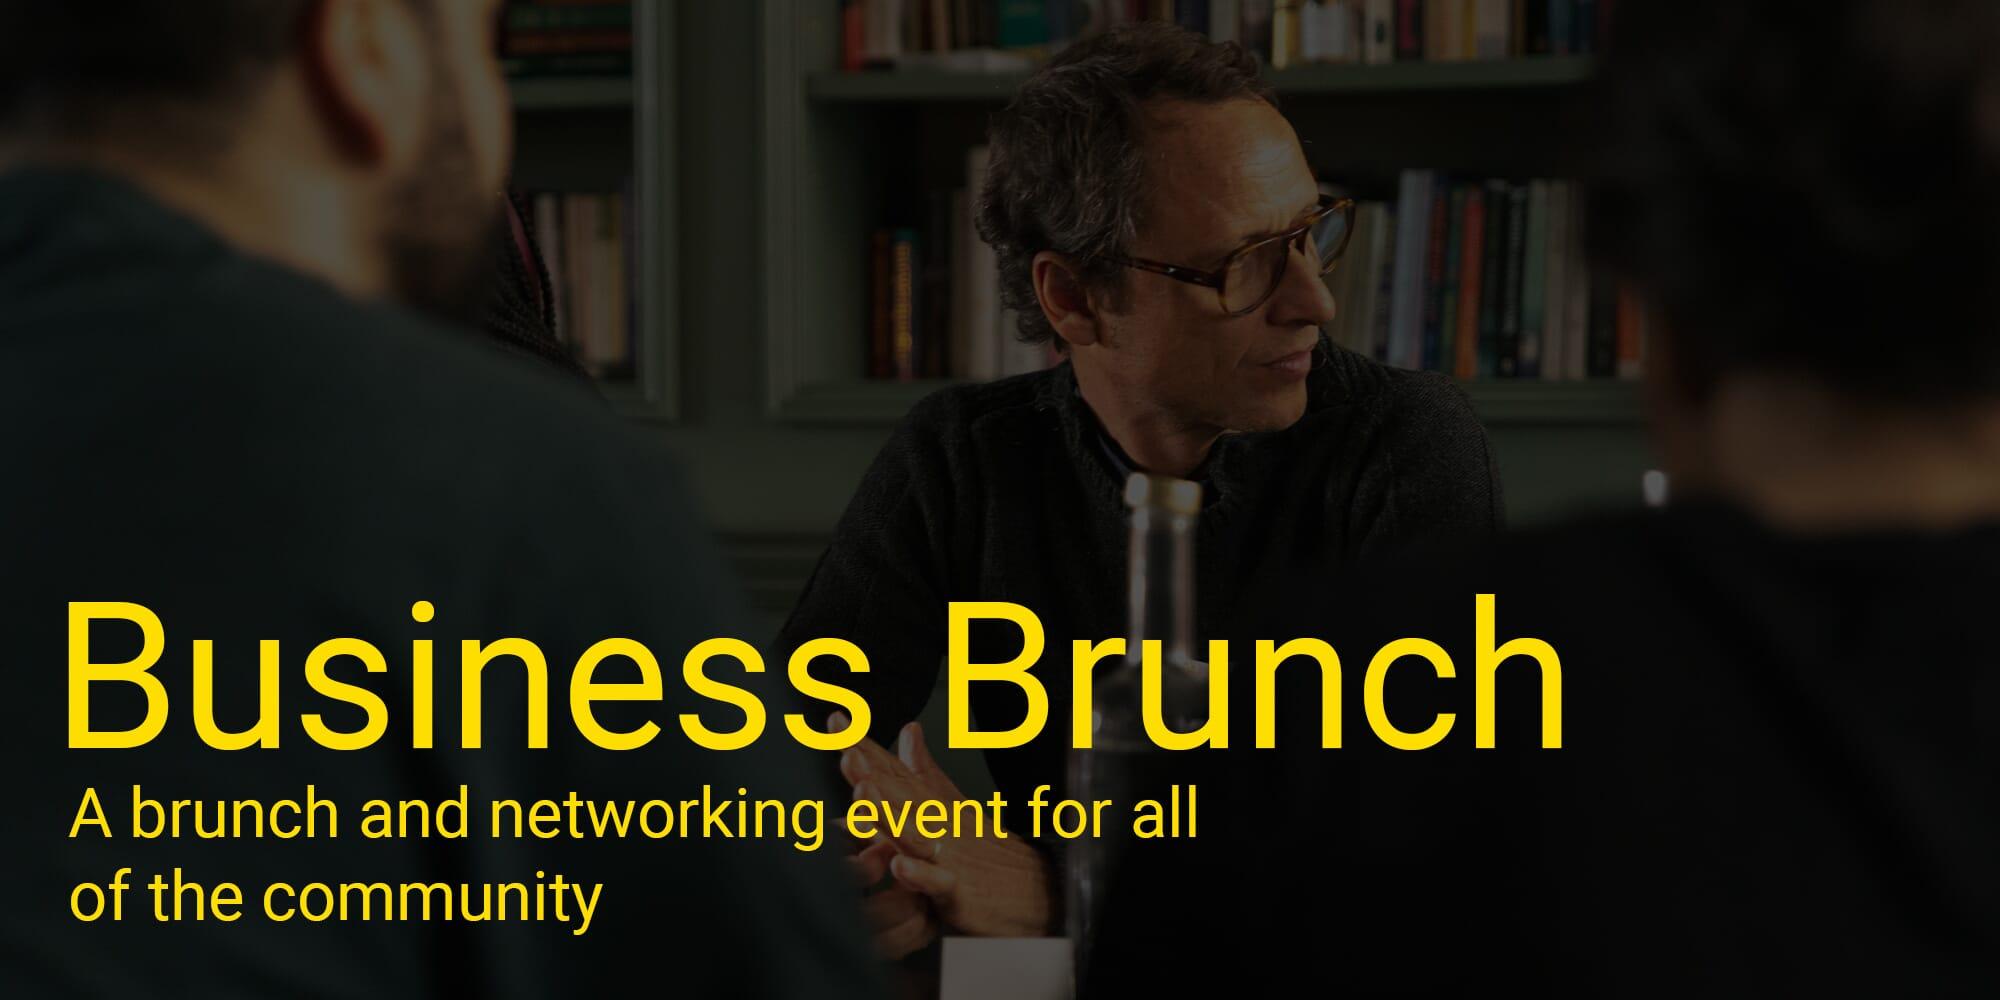 Business Brunch